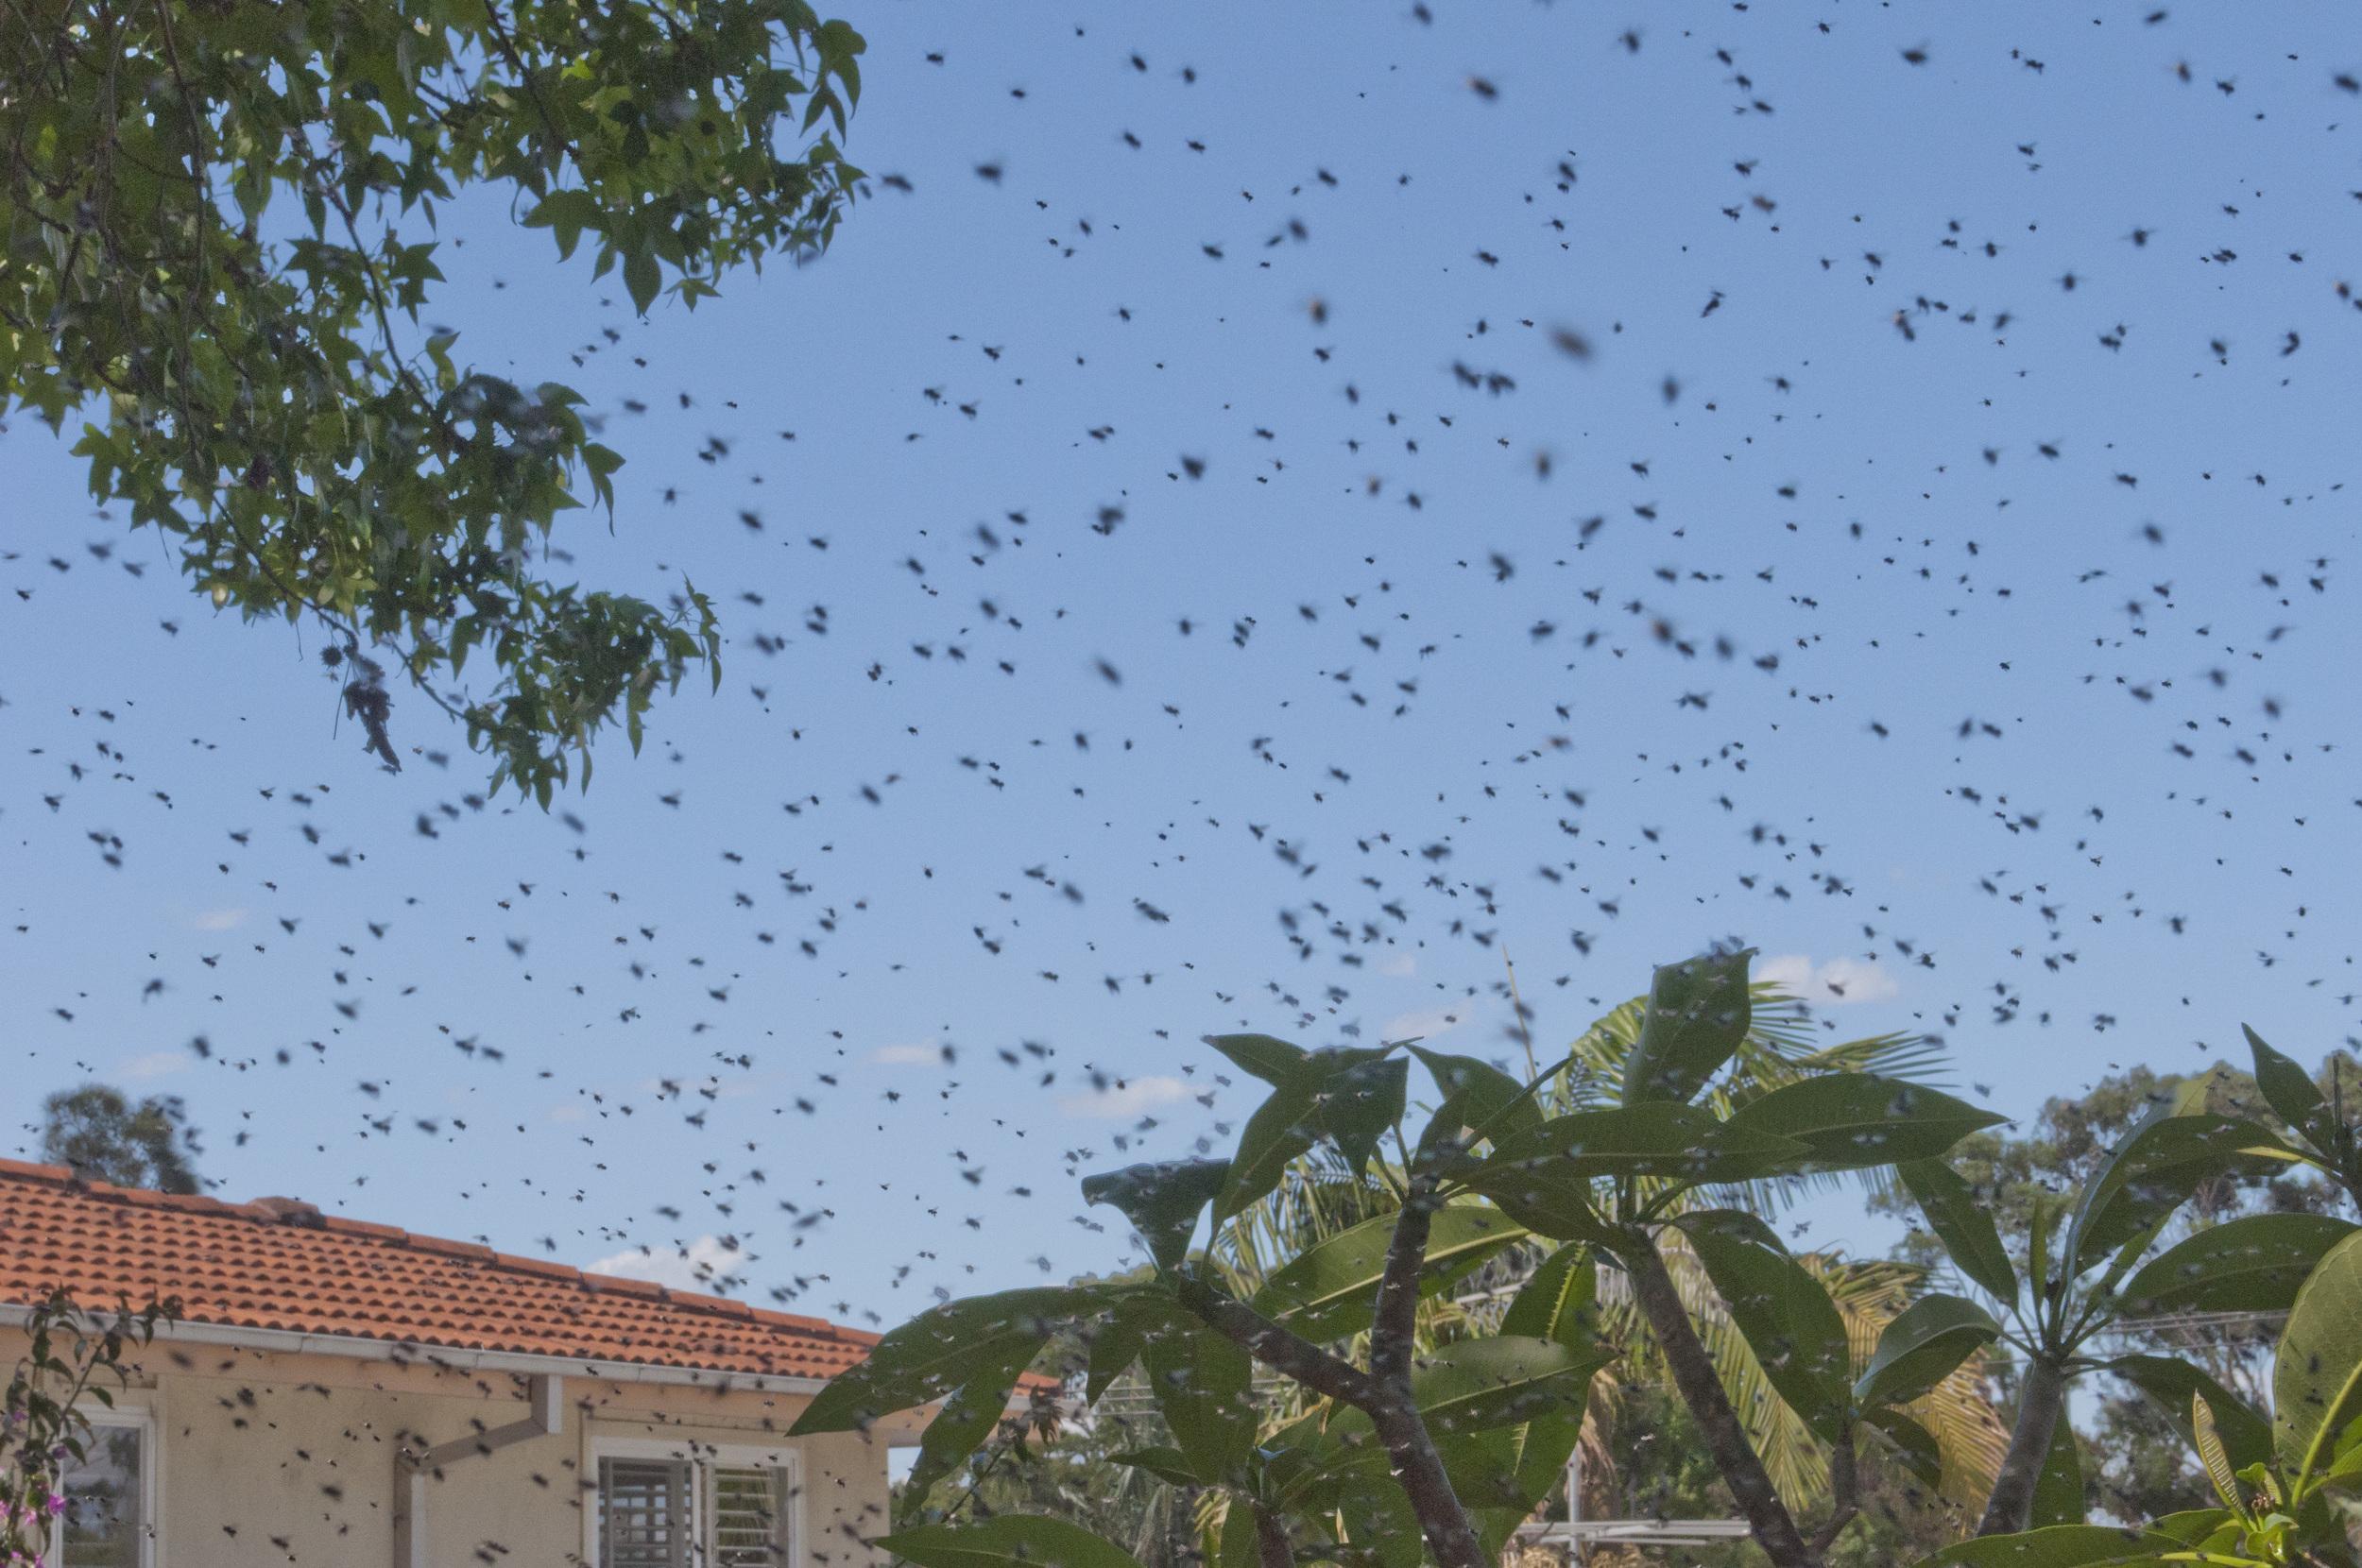 swarm and neighbour hosue.jpg